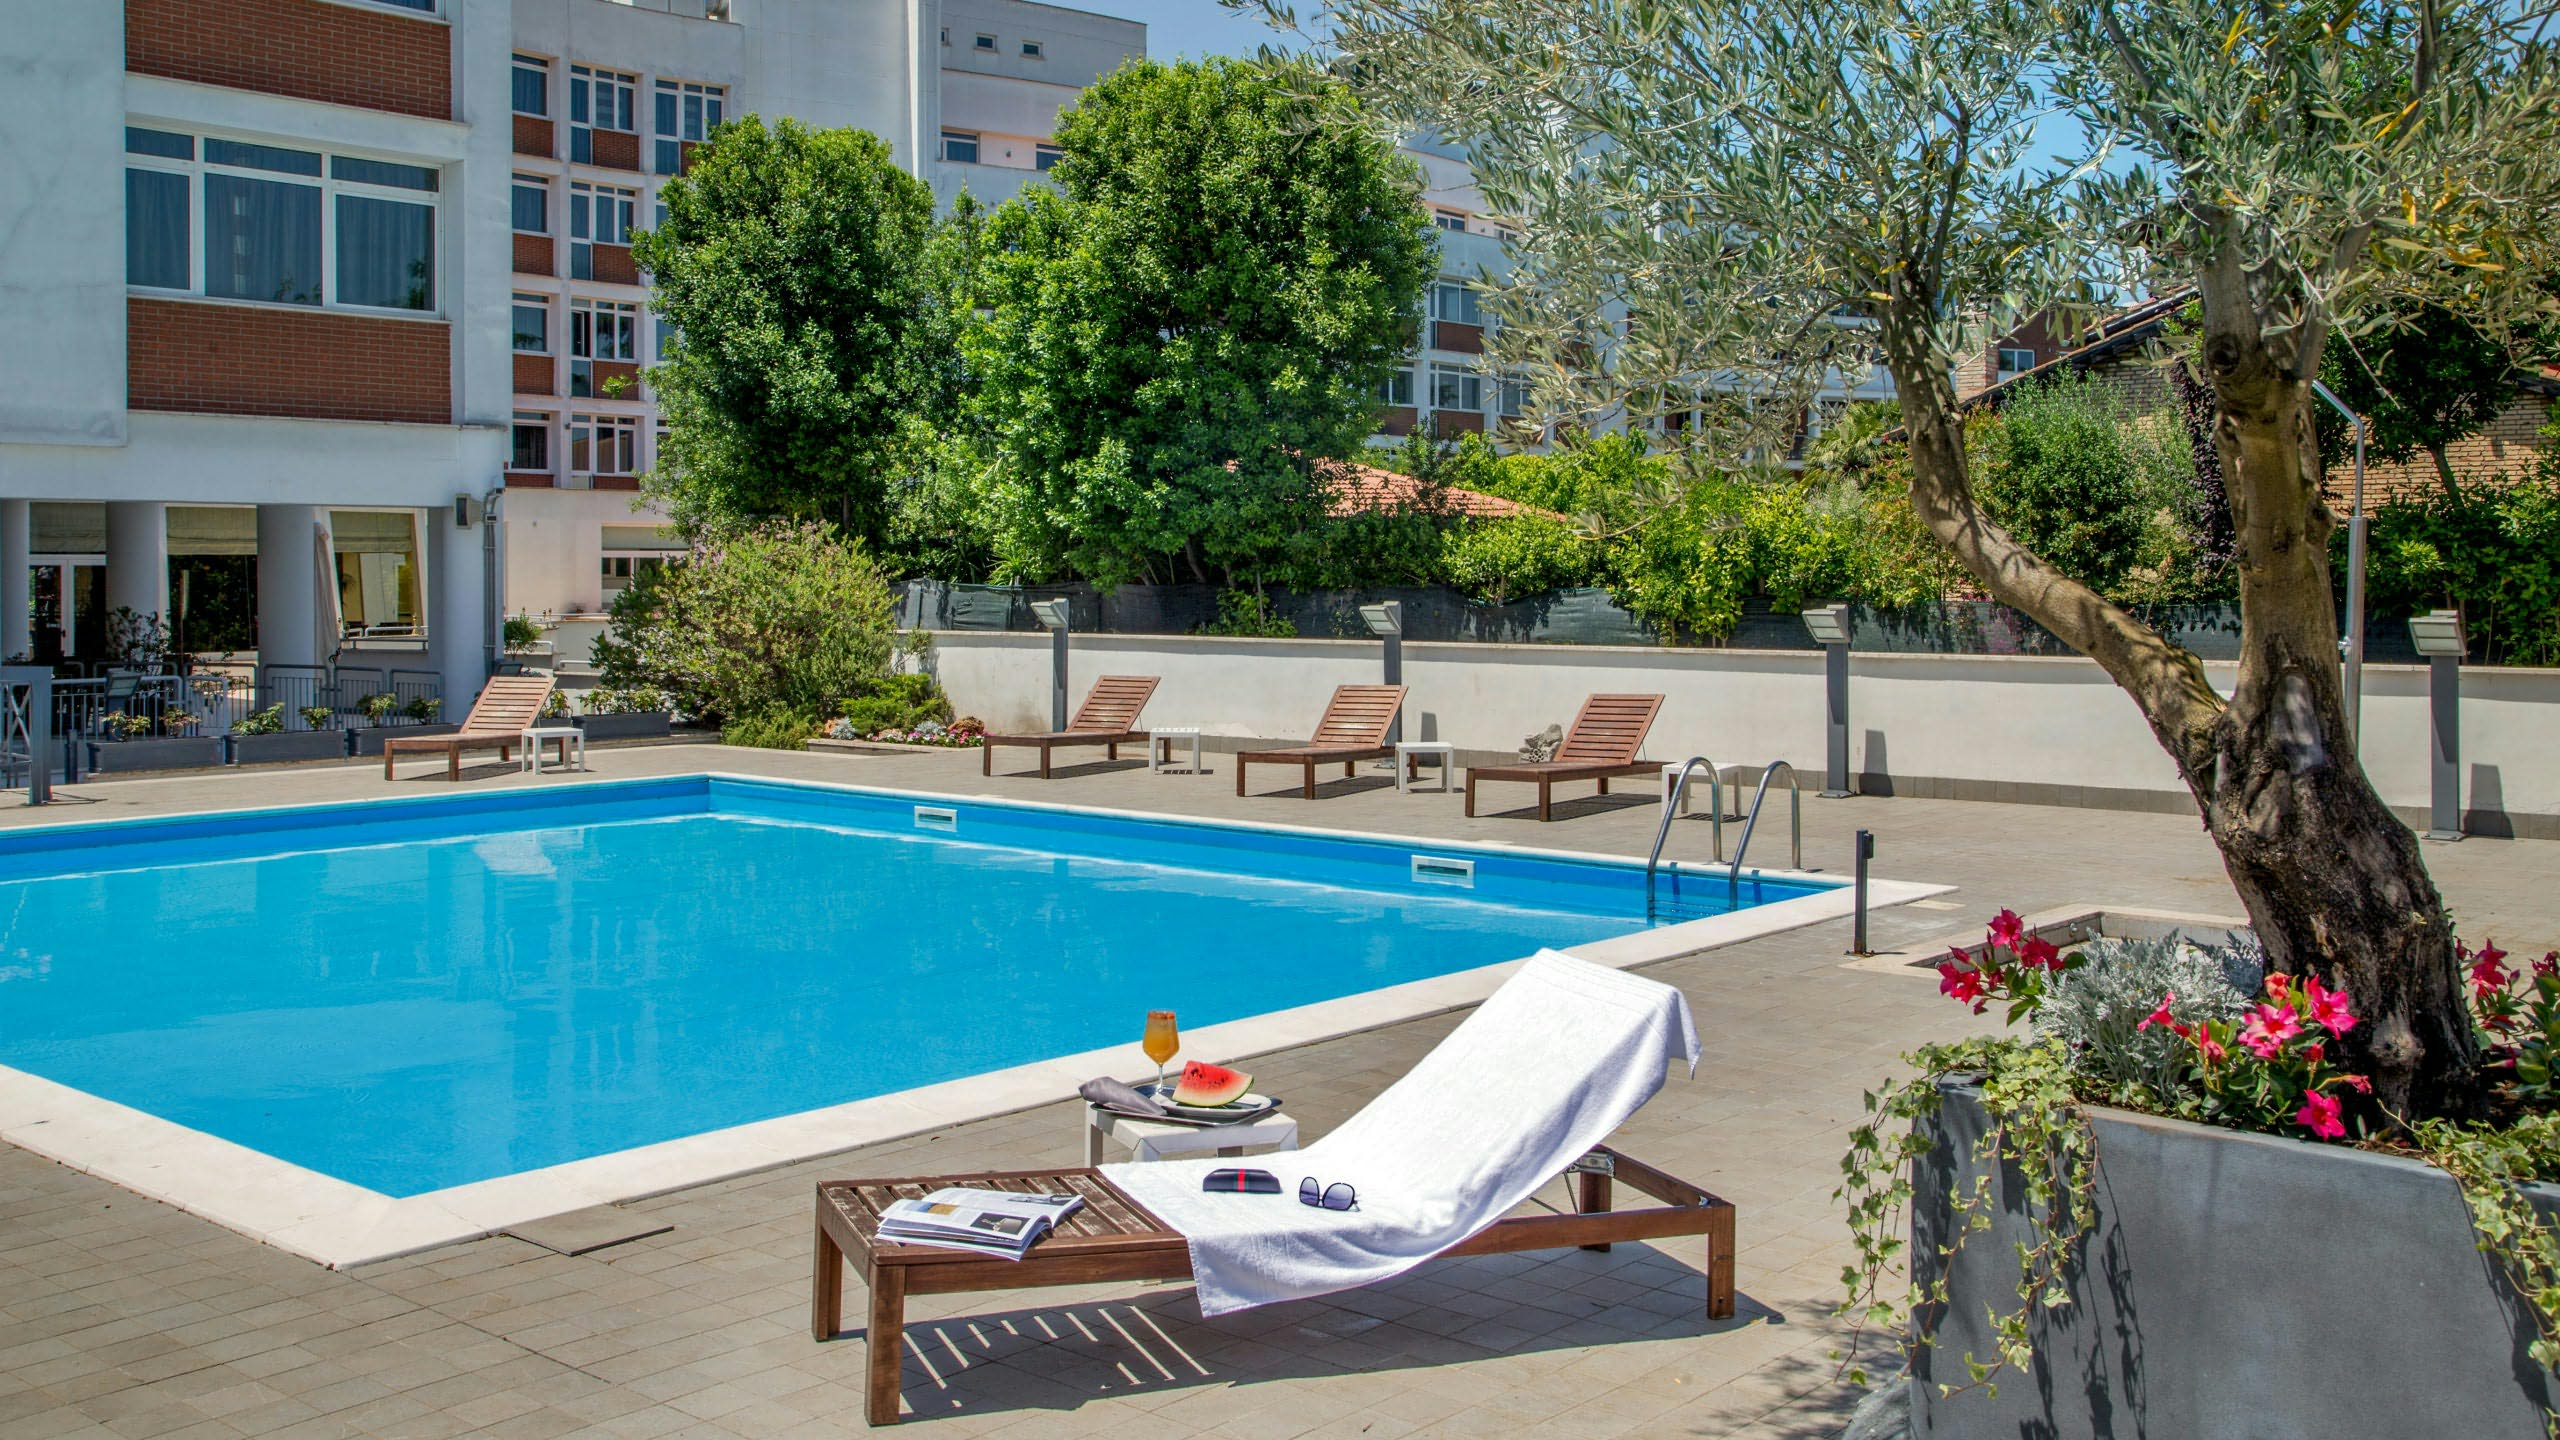 hotel-capannelle-rome-commonareas-14